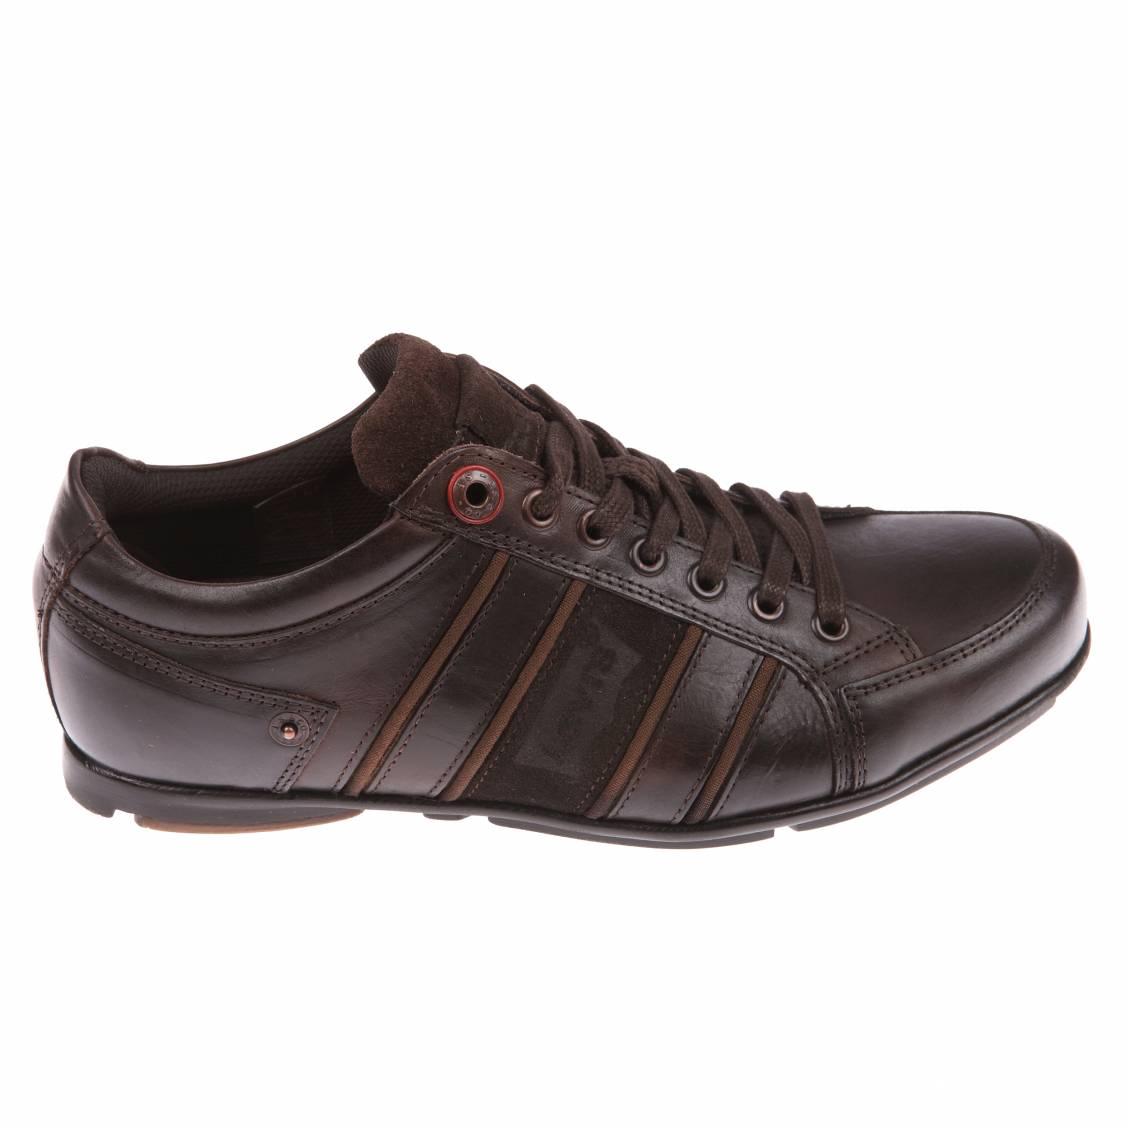 chaussures homme levi s en cuir marron. Black Bedroom Furniture Sets. Home Design Ideas